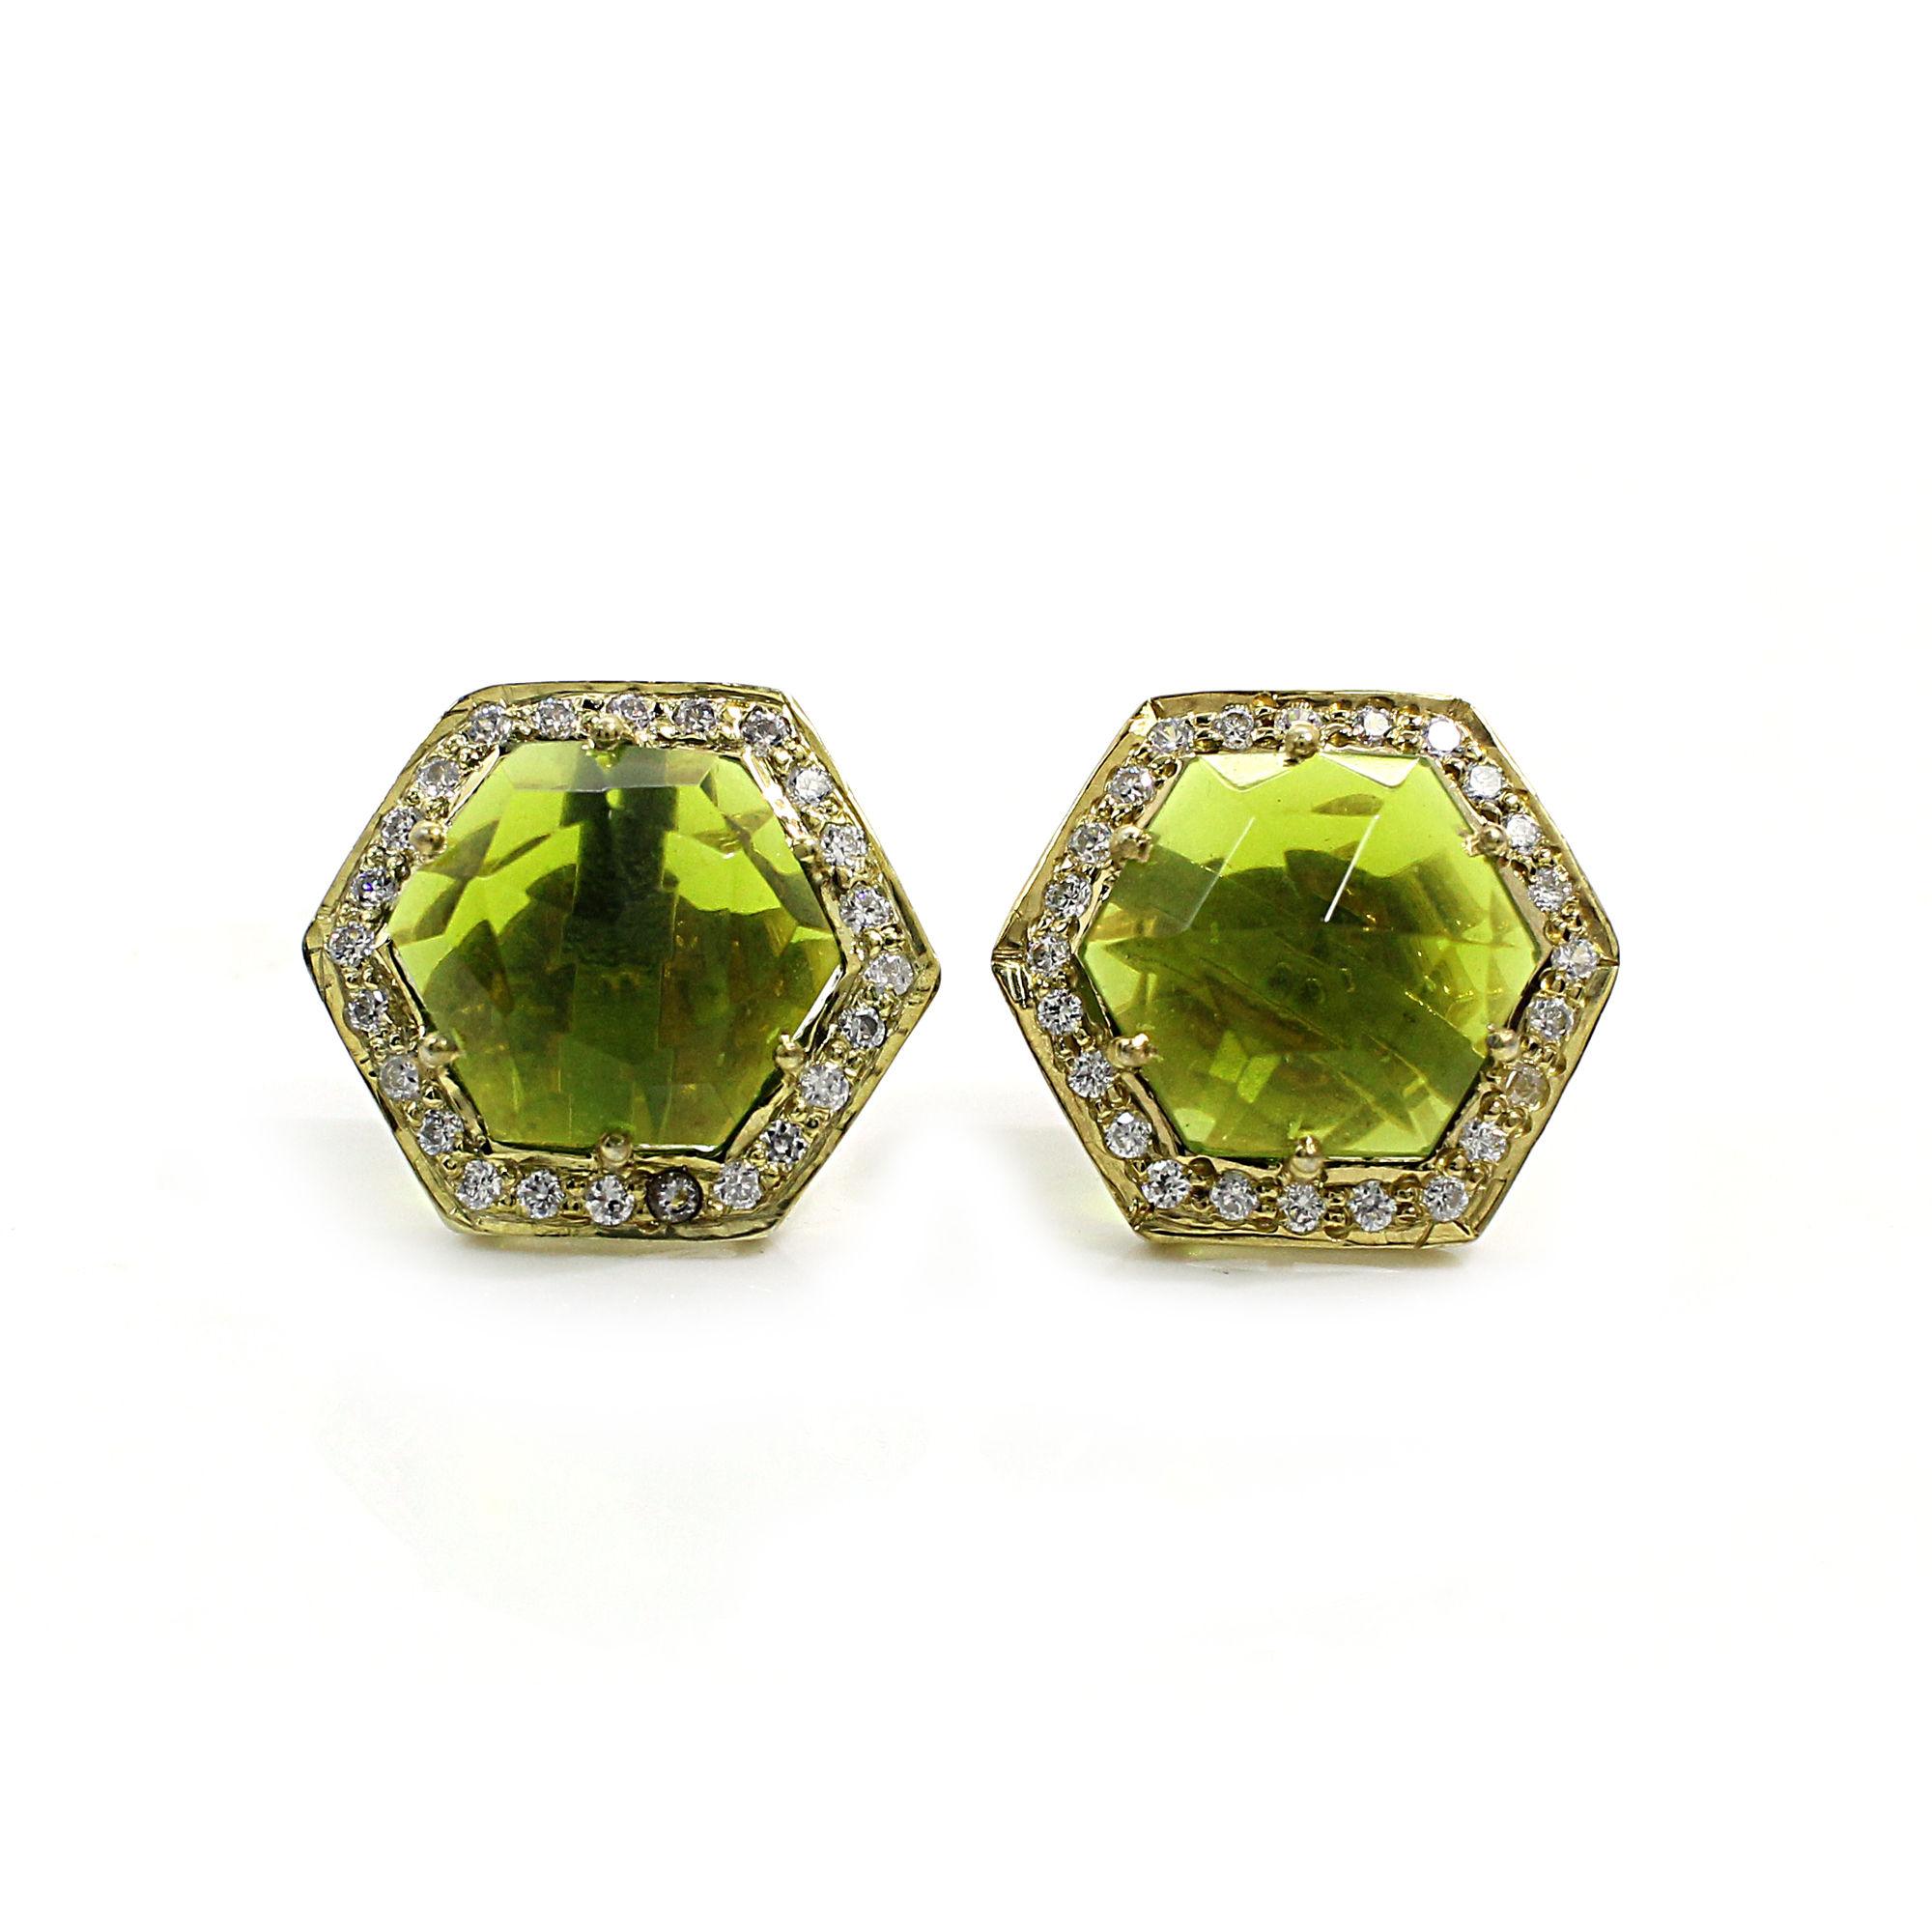 Peridot Hydro with CZ Silver Stud Earrings